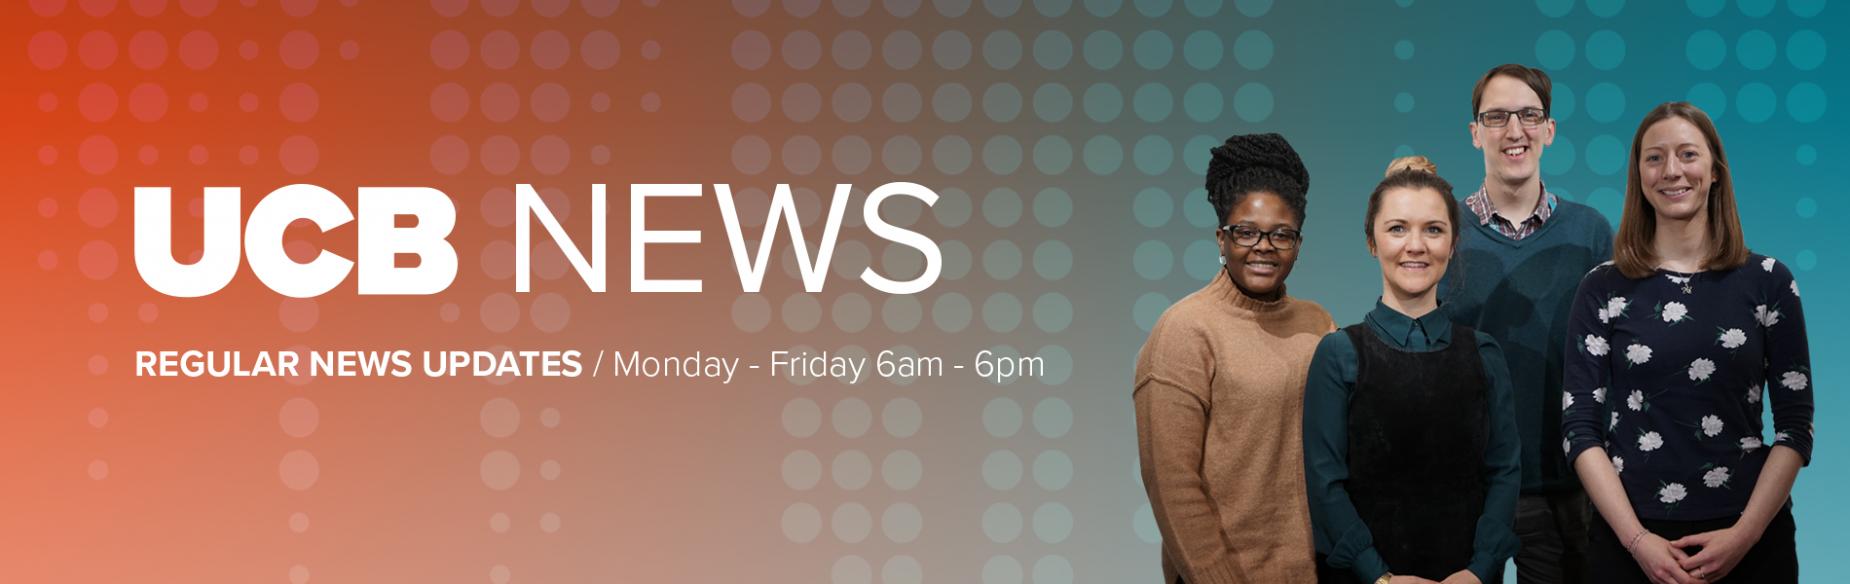 UCB News